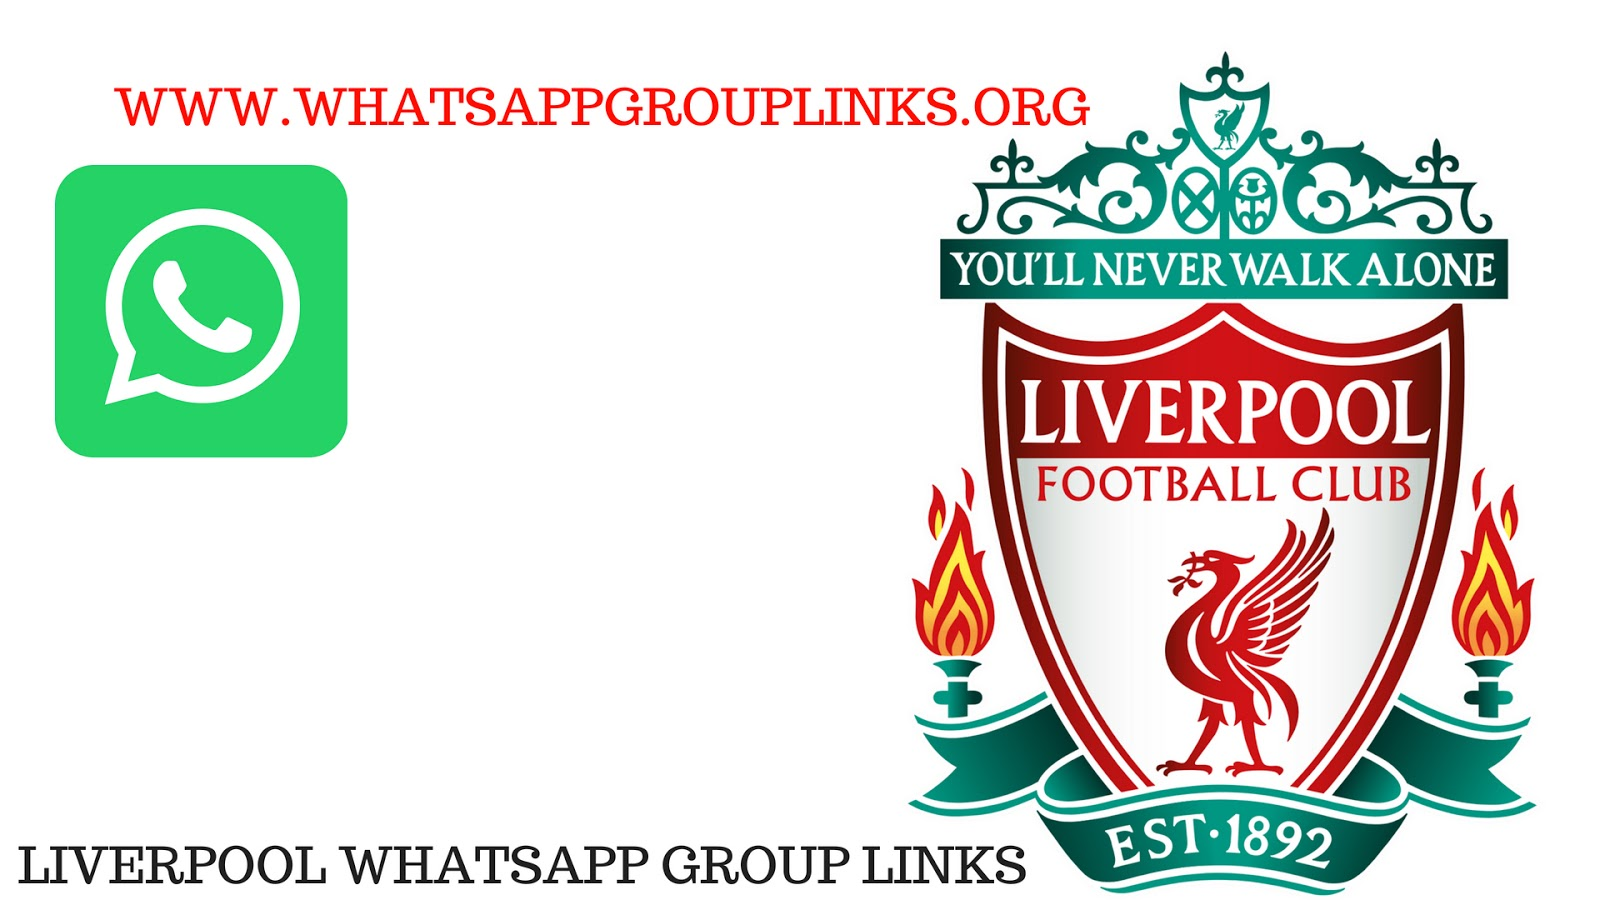 JOIN LIVERPOOL FC WHATSAPP GROUP LINKS LIST - Whatsapp Group